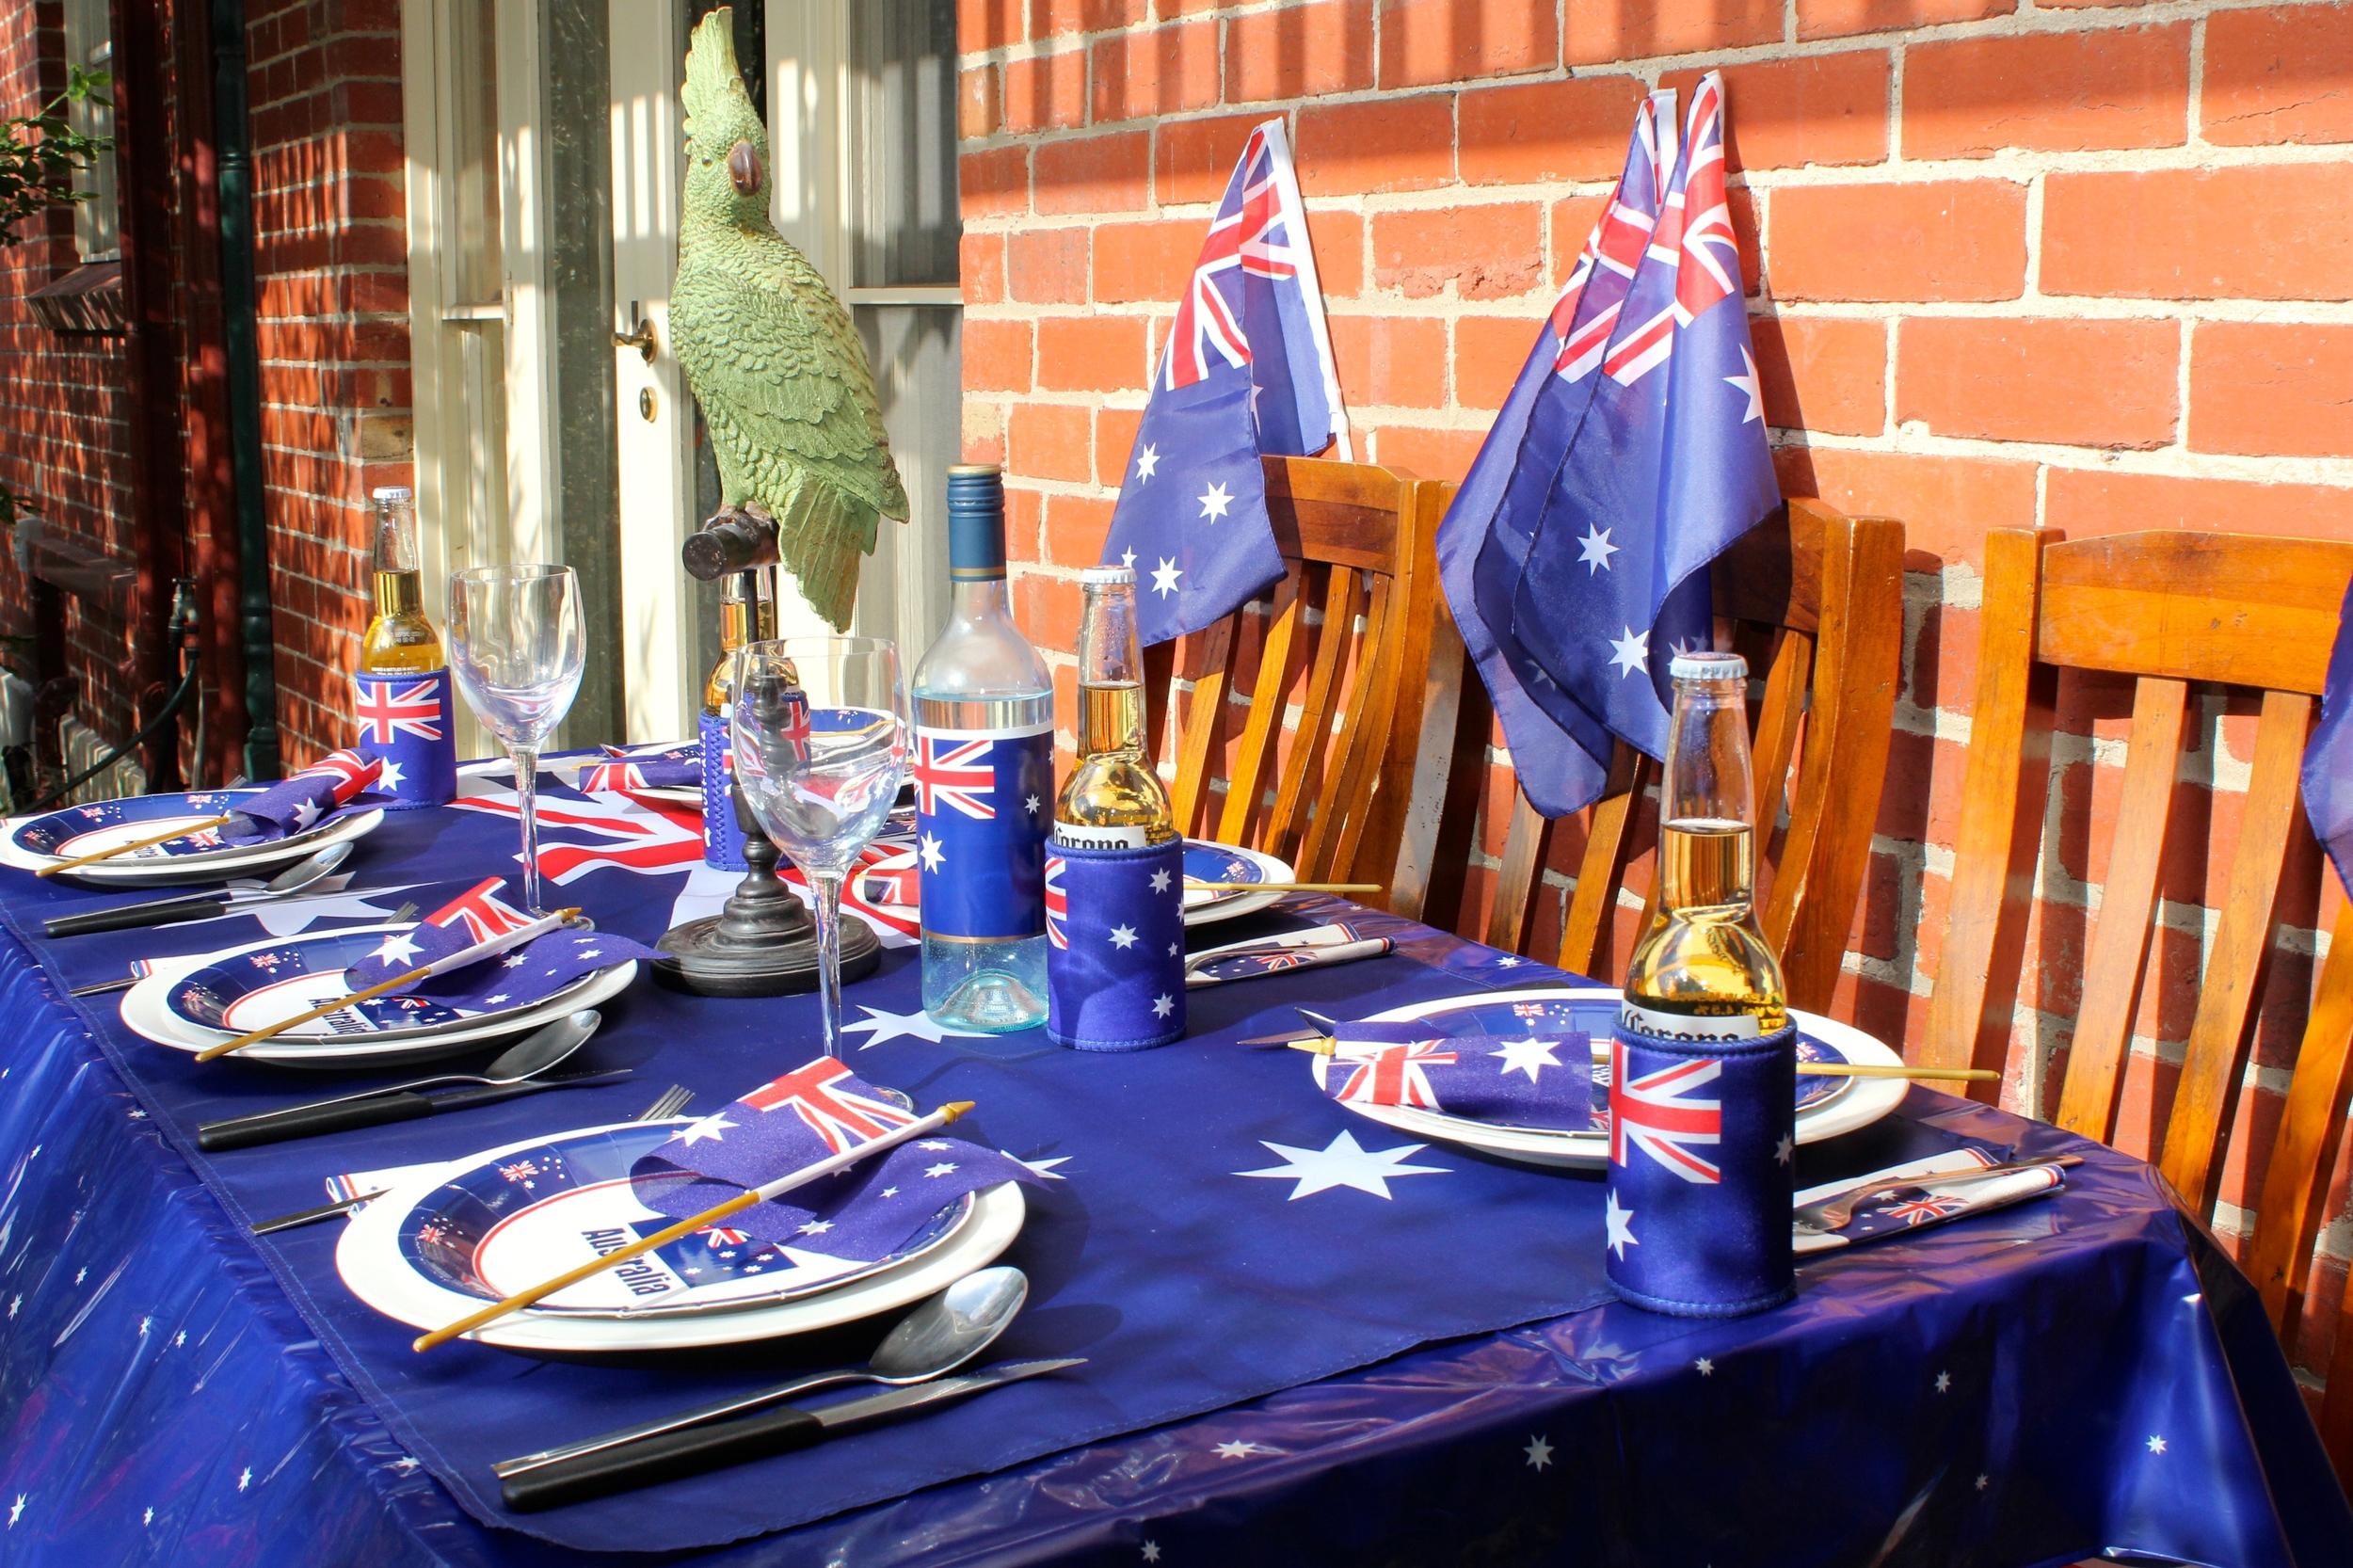 Australia Day Dining Setting